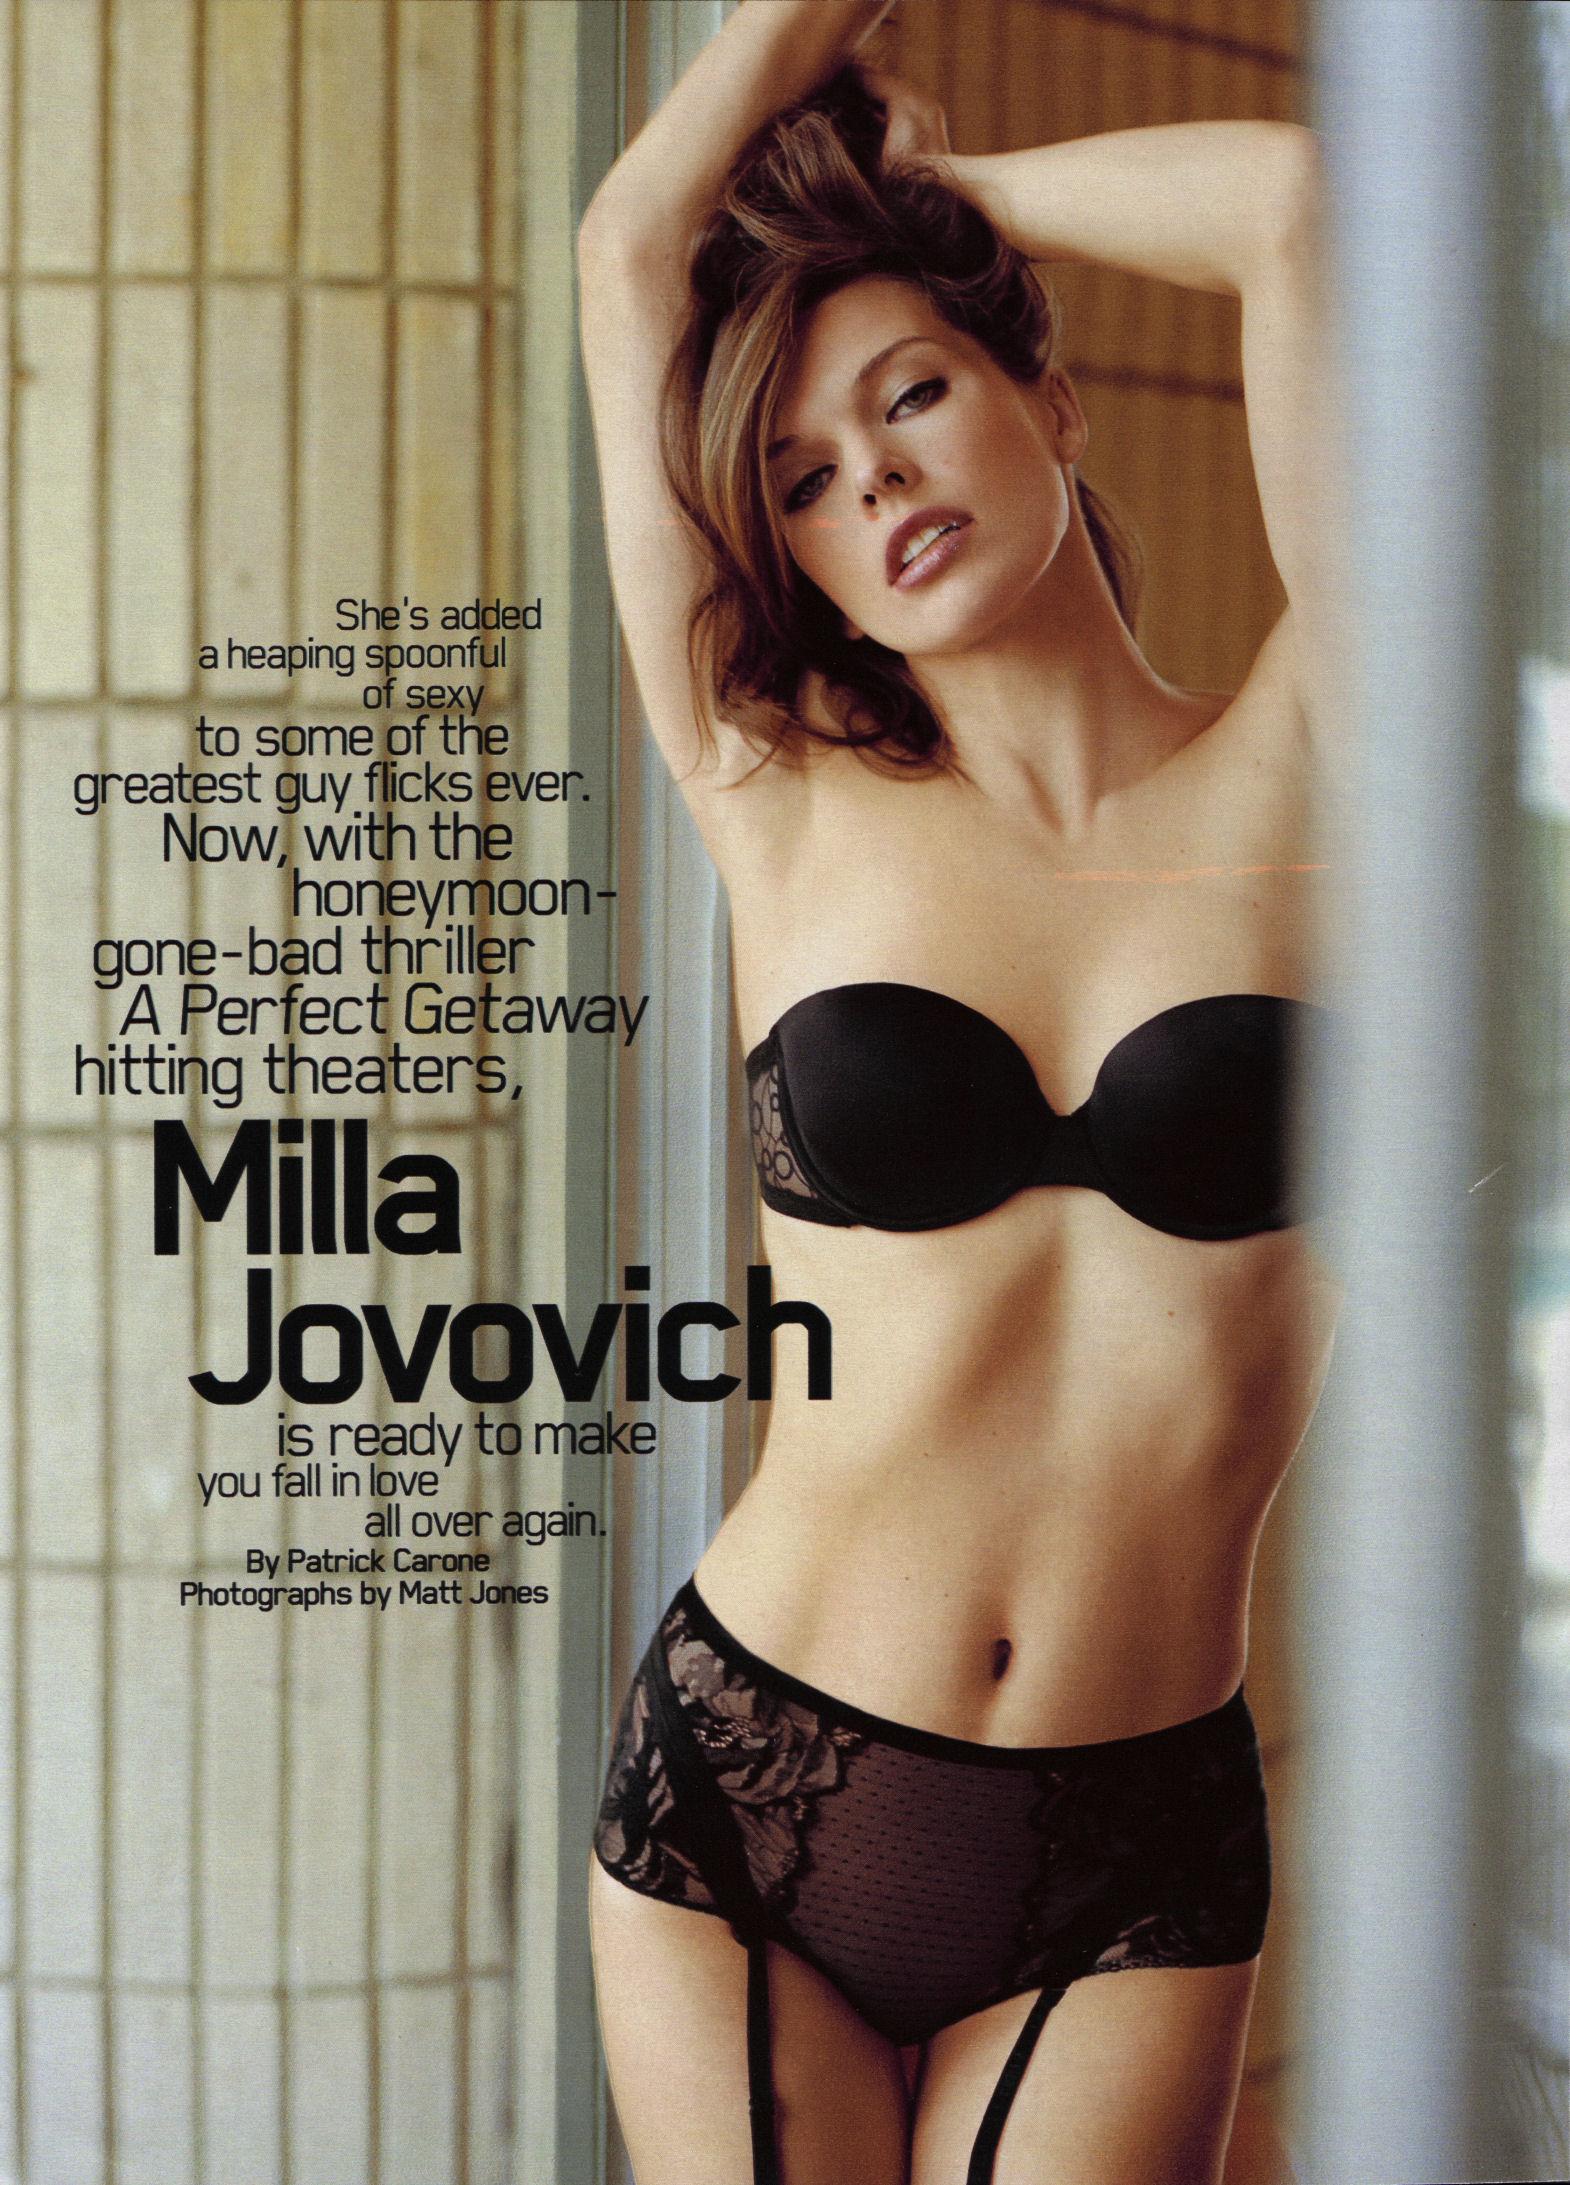 milla jovovich fucked